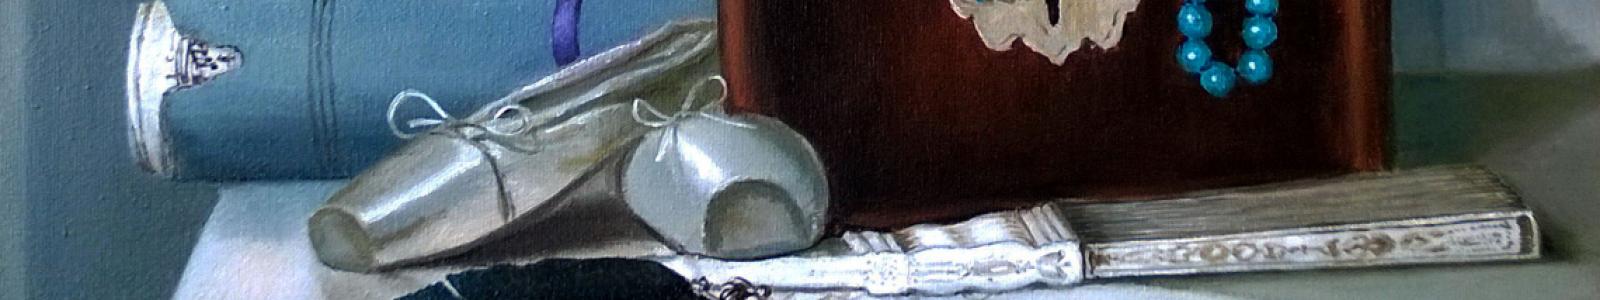 Galerie Peintre Slava Chilikin